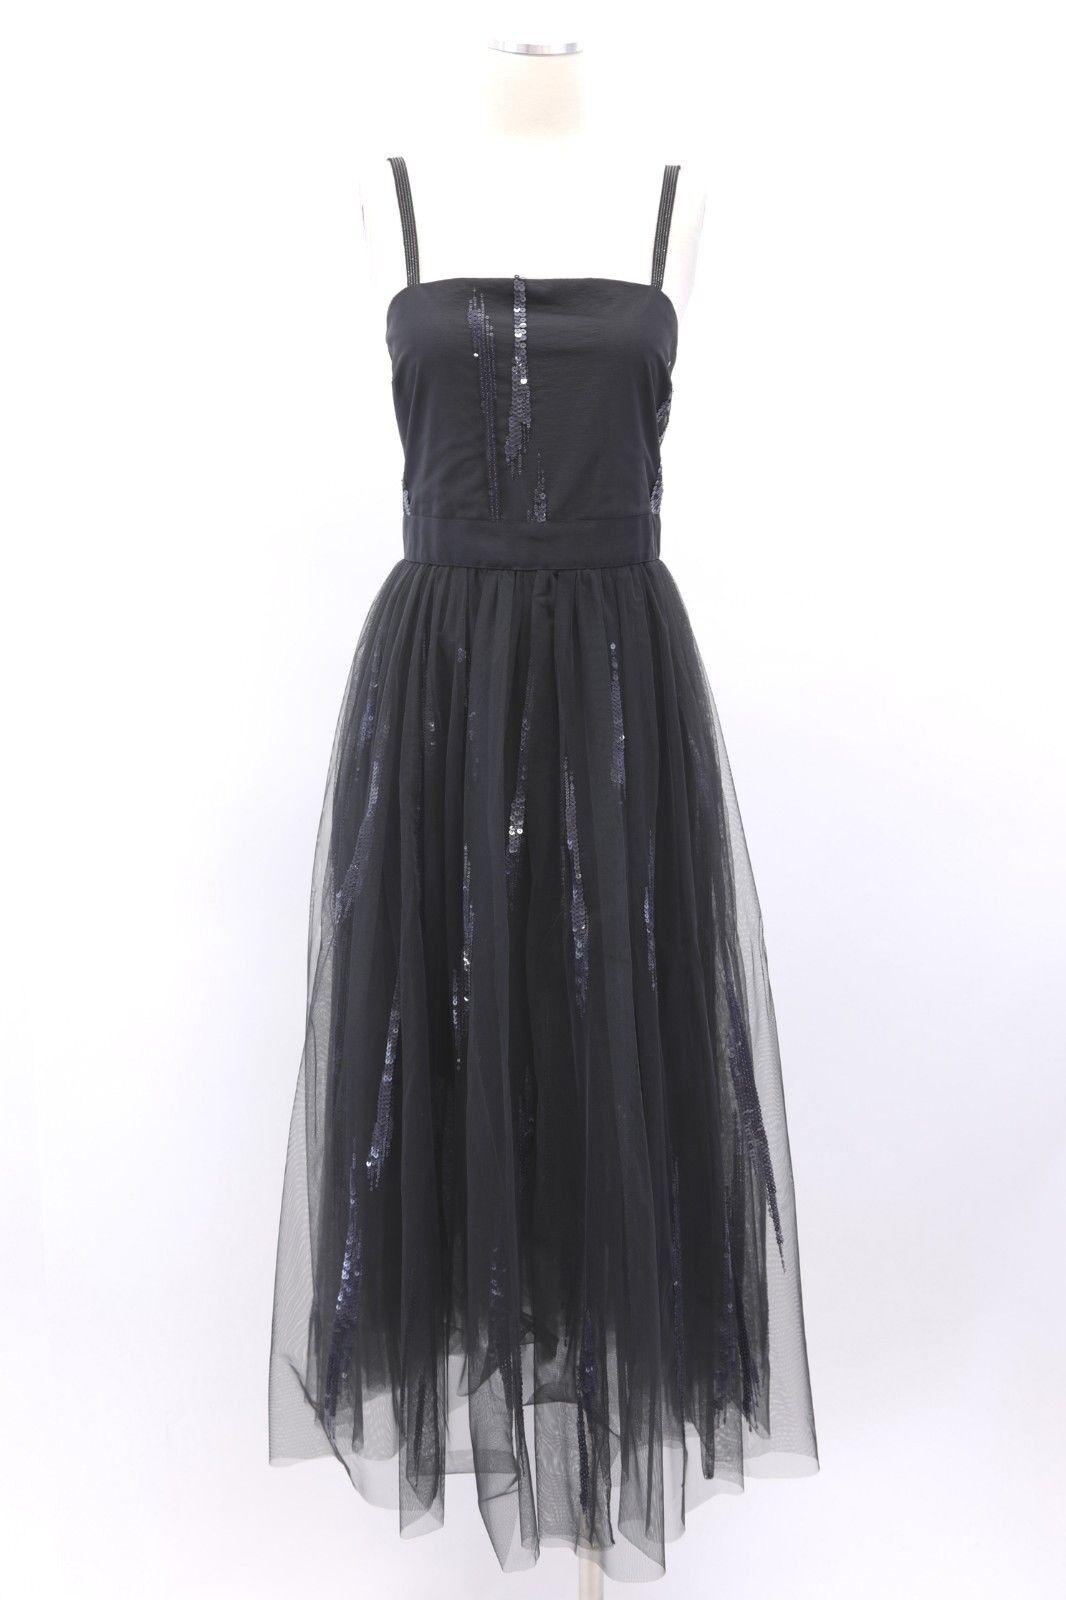 NWT 4575 Brunello Cucinelli Sequined Tulle Dress W Monili Beaded Straps SzM A186